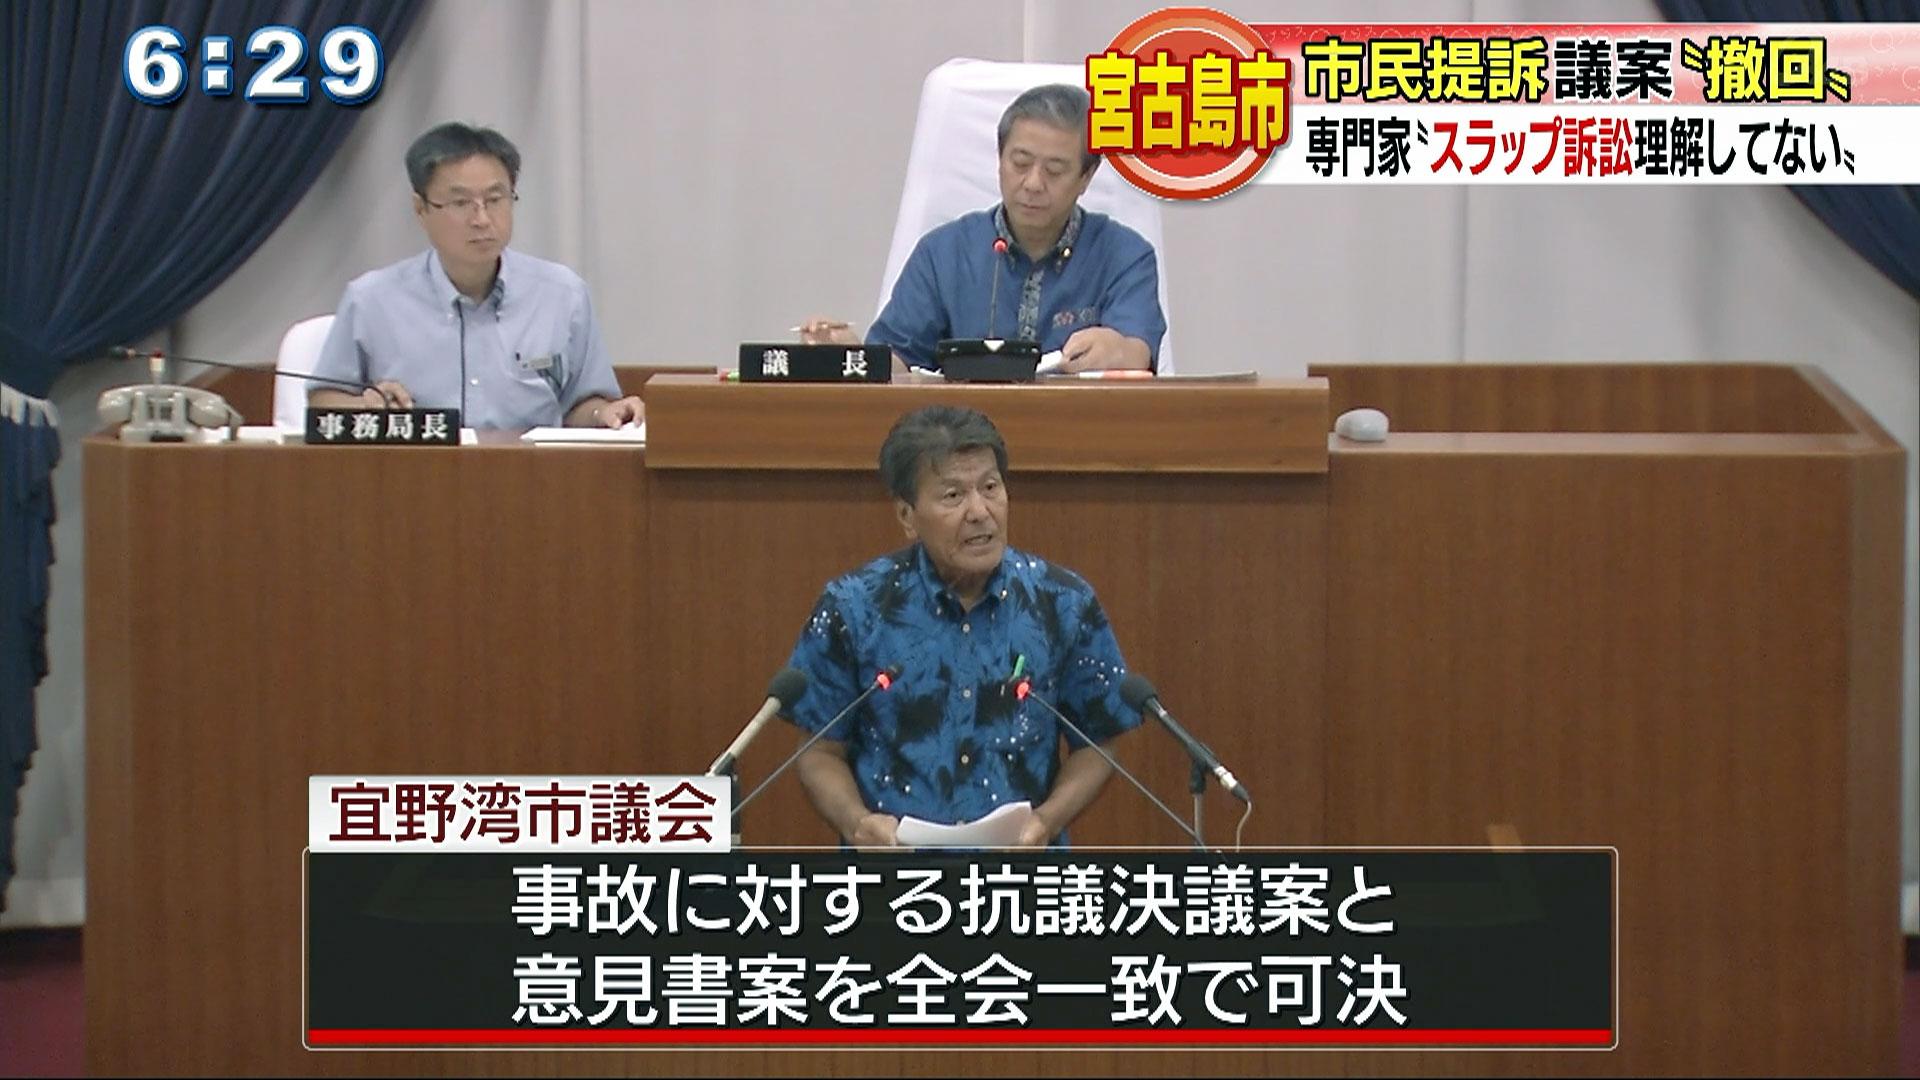 宜野湾市議会・窓落下時事故への抗議決議と意見書